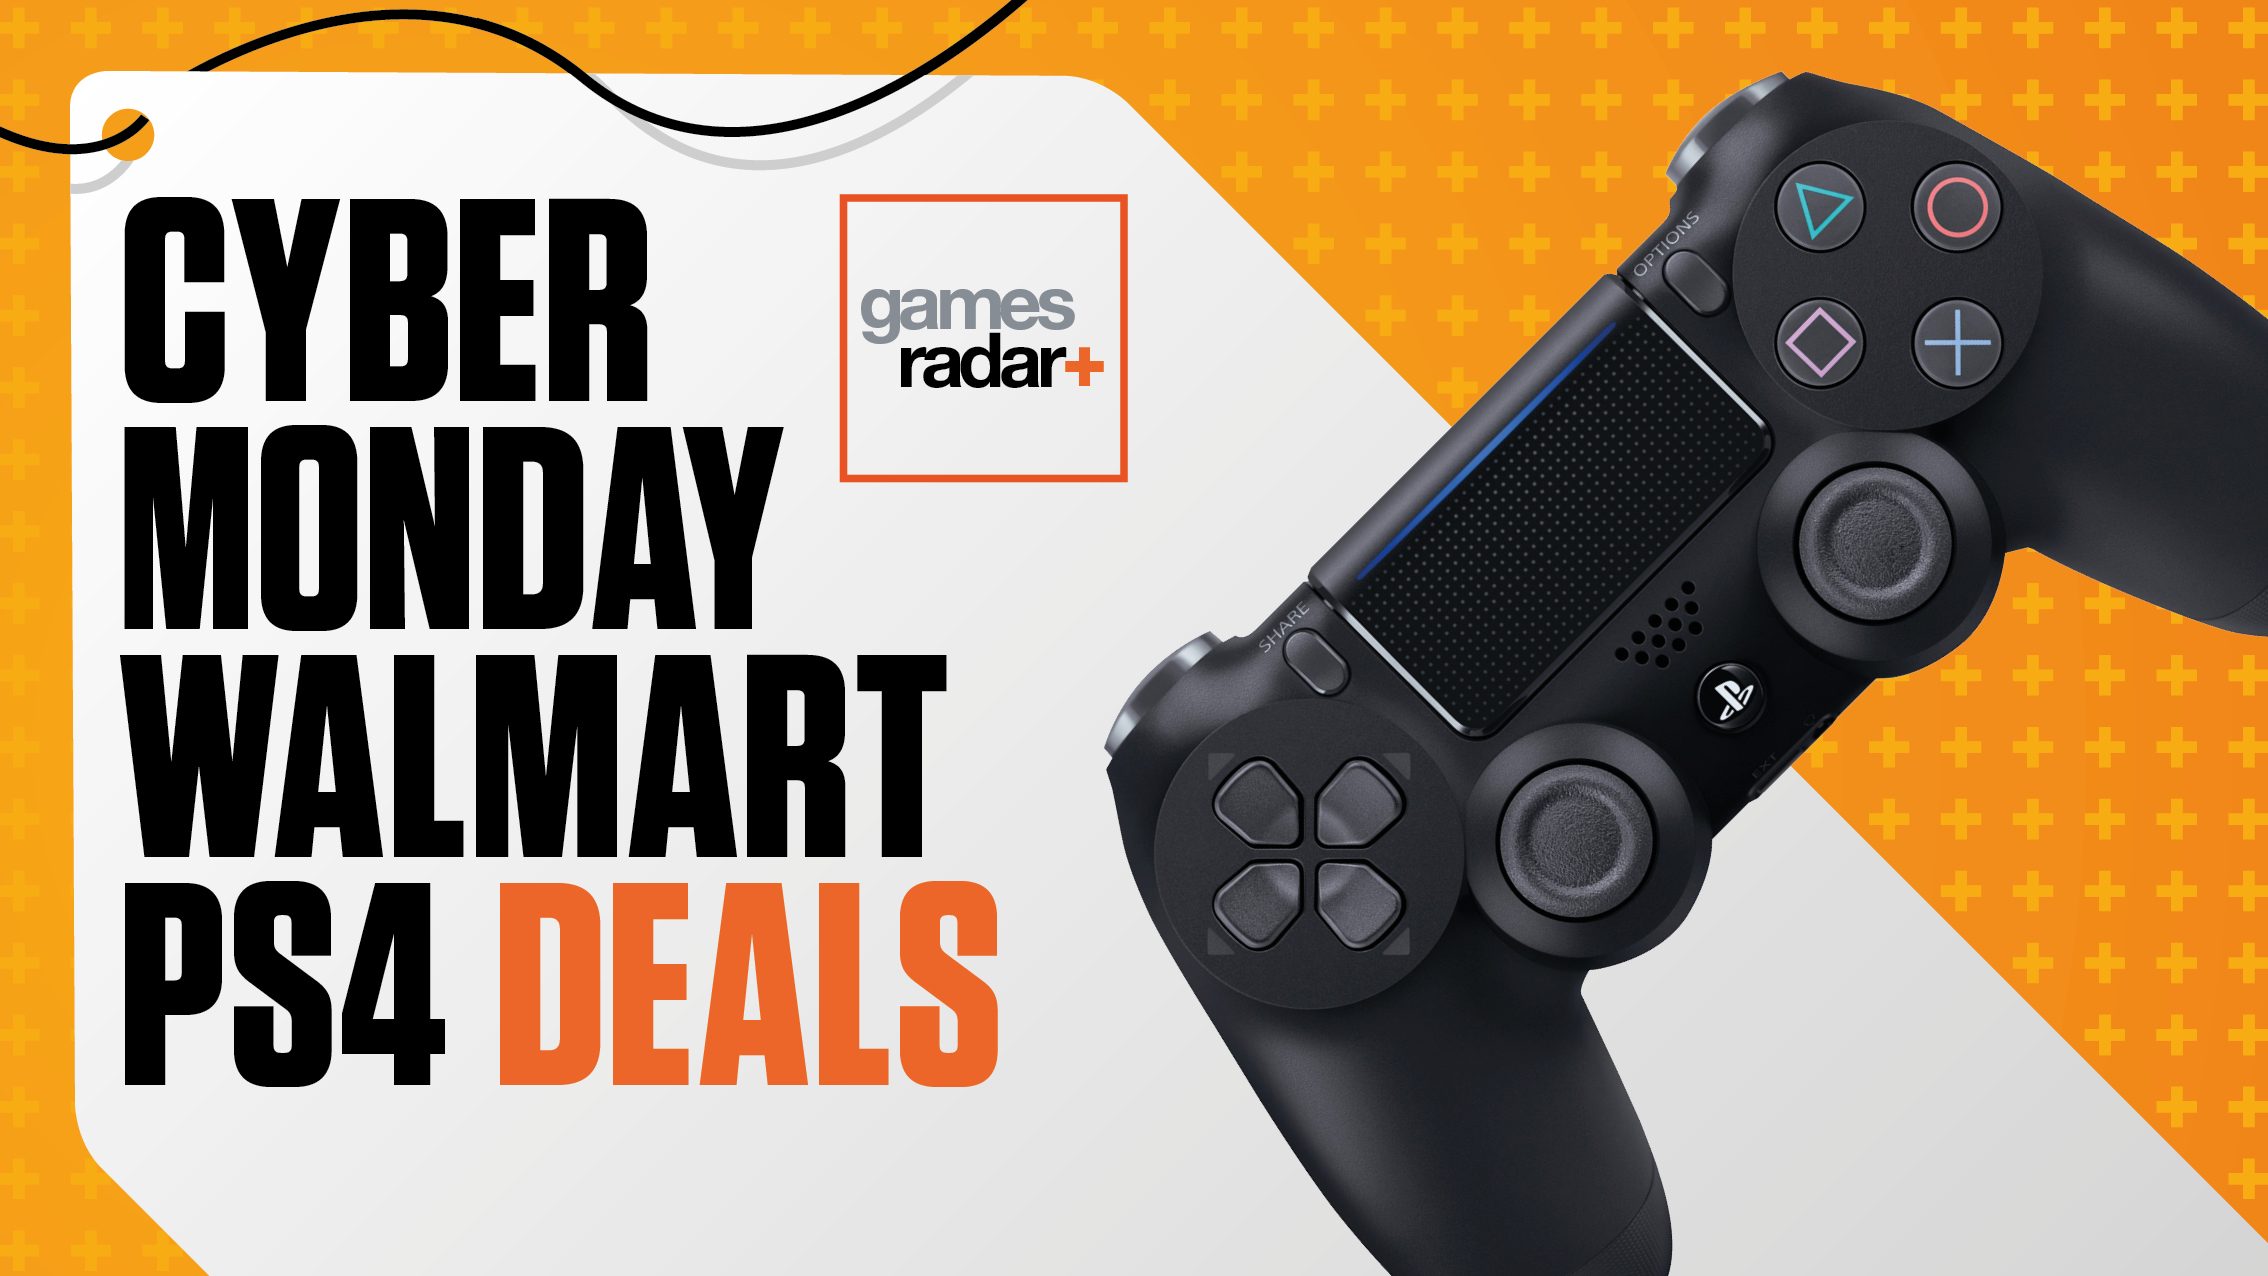 Cyber Week Walmart PS4 discounts 2019 | GamesRadar+